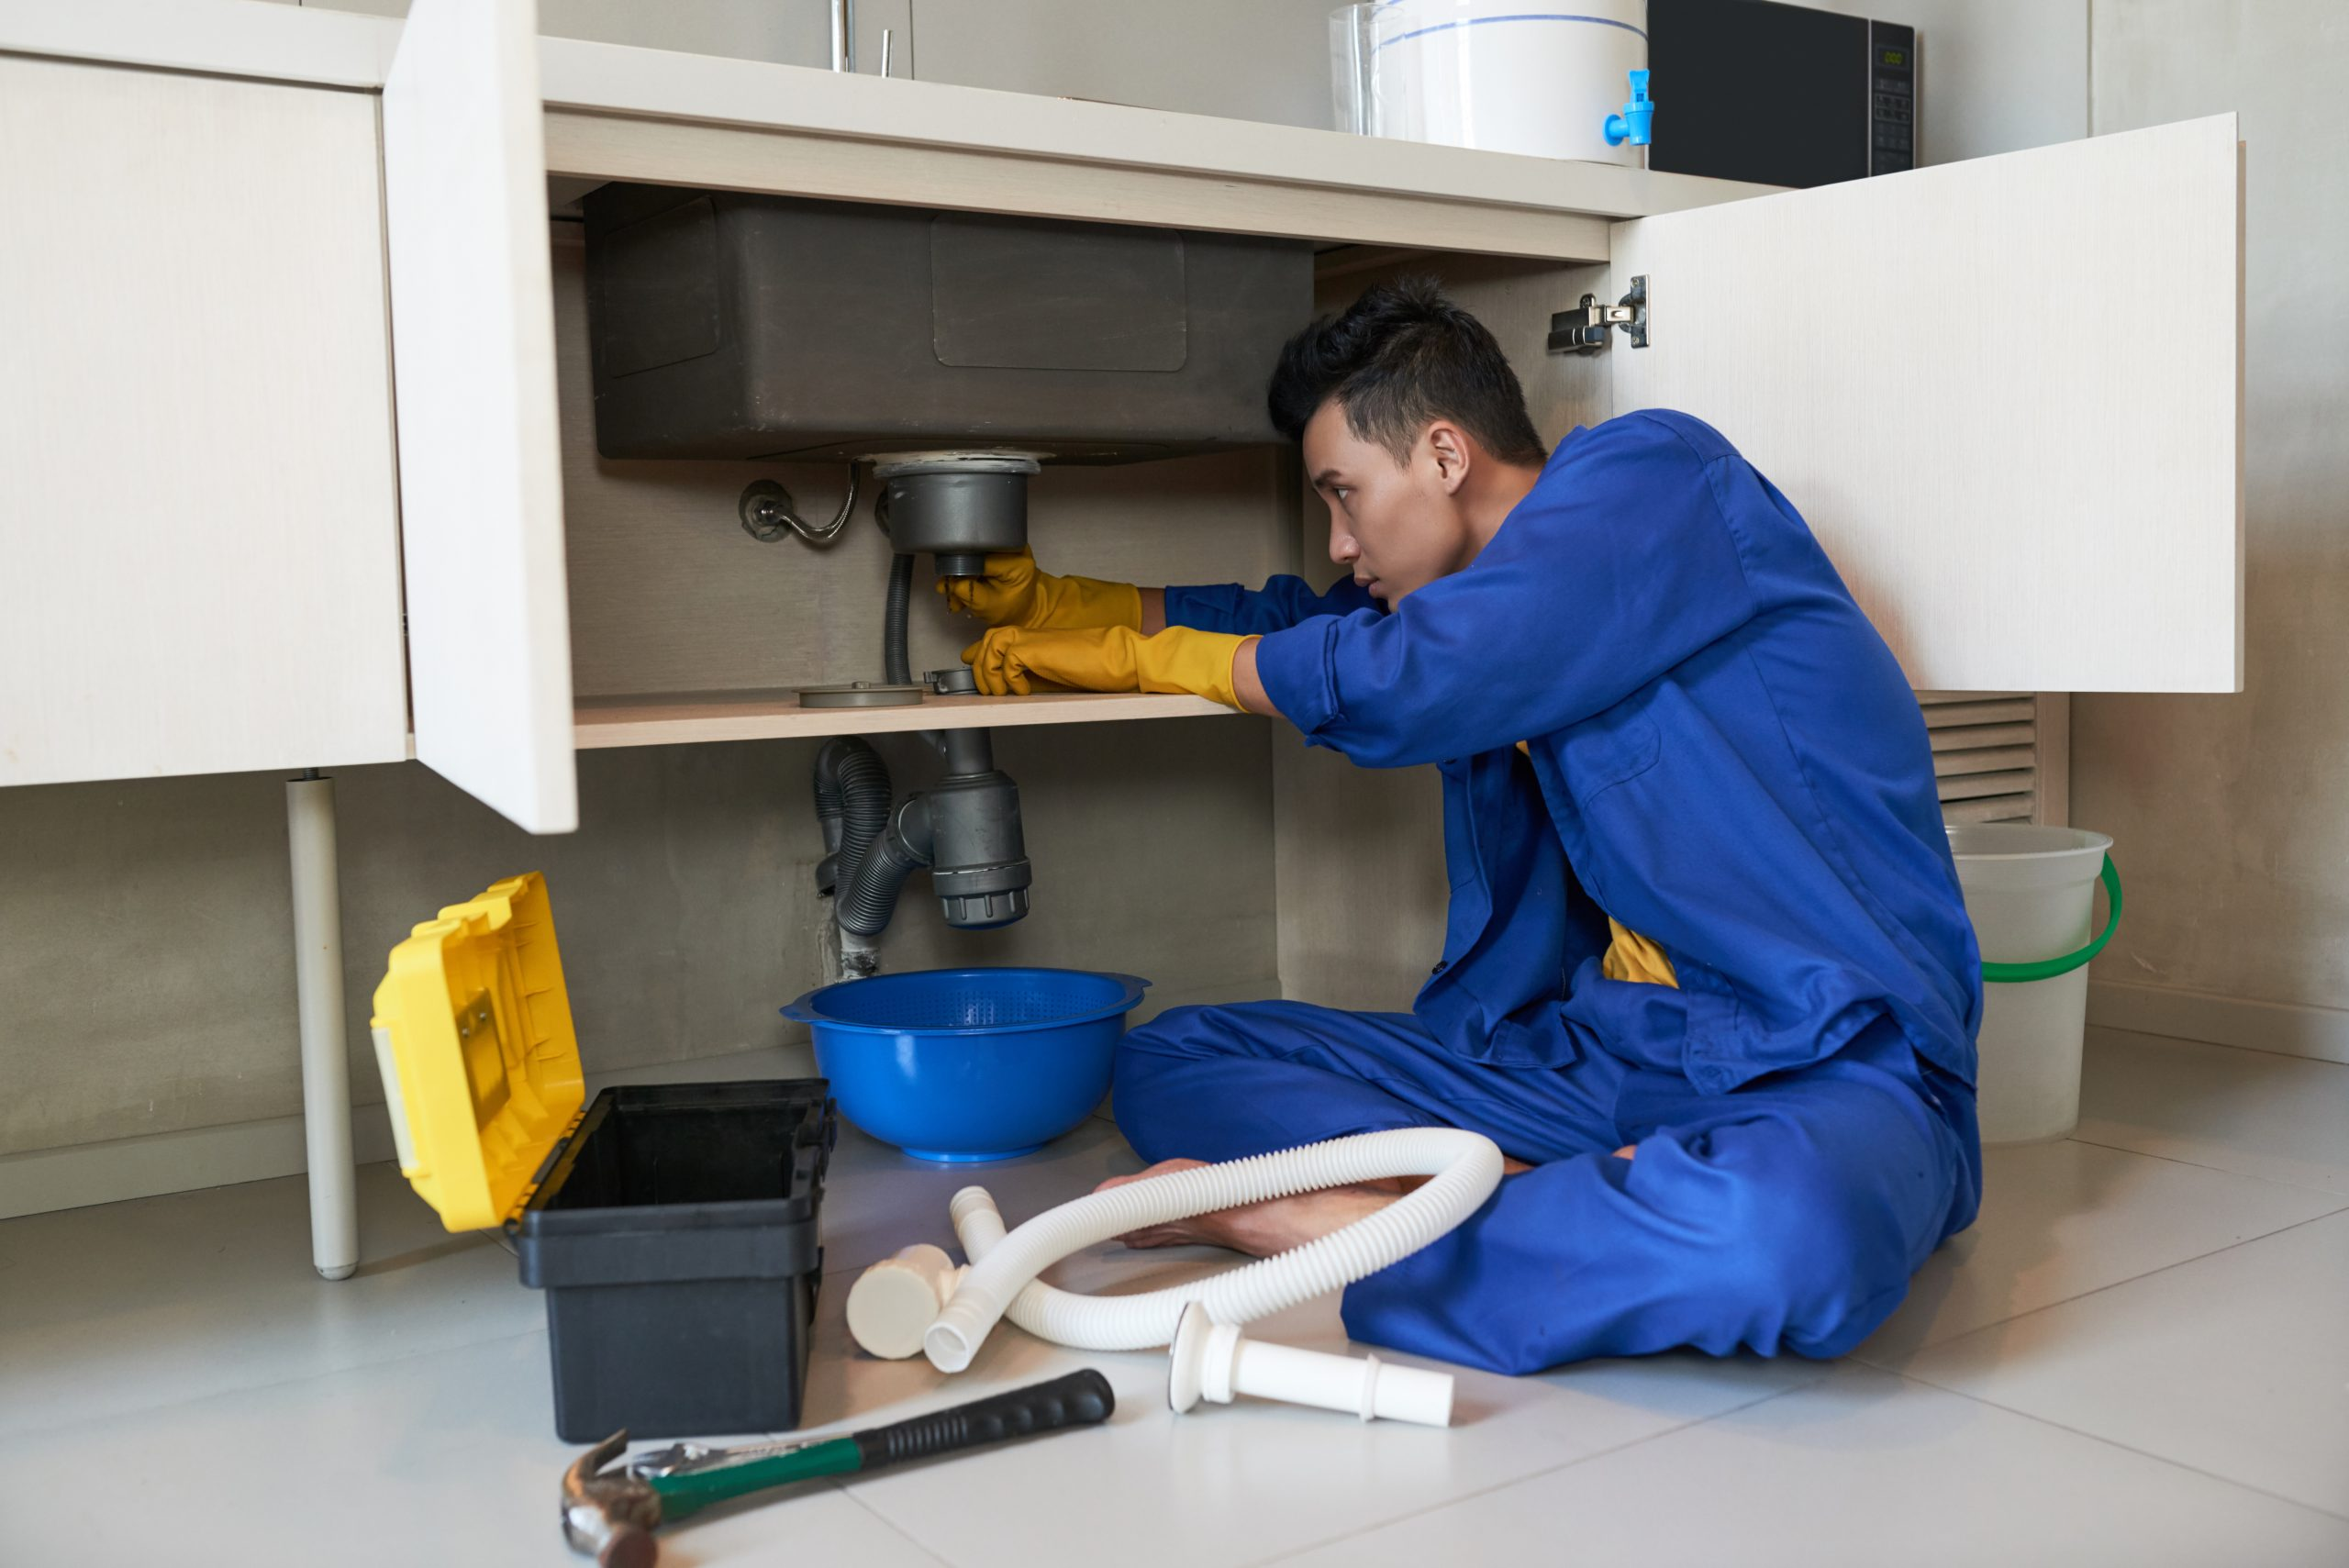 Emergency Plumber Los Angeles – John Doe at Your Service